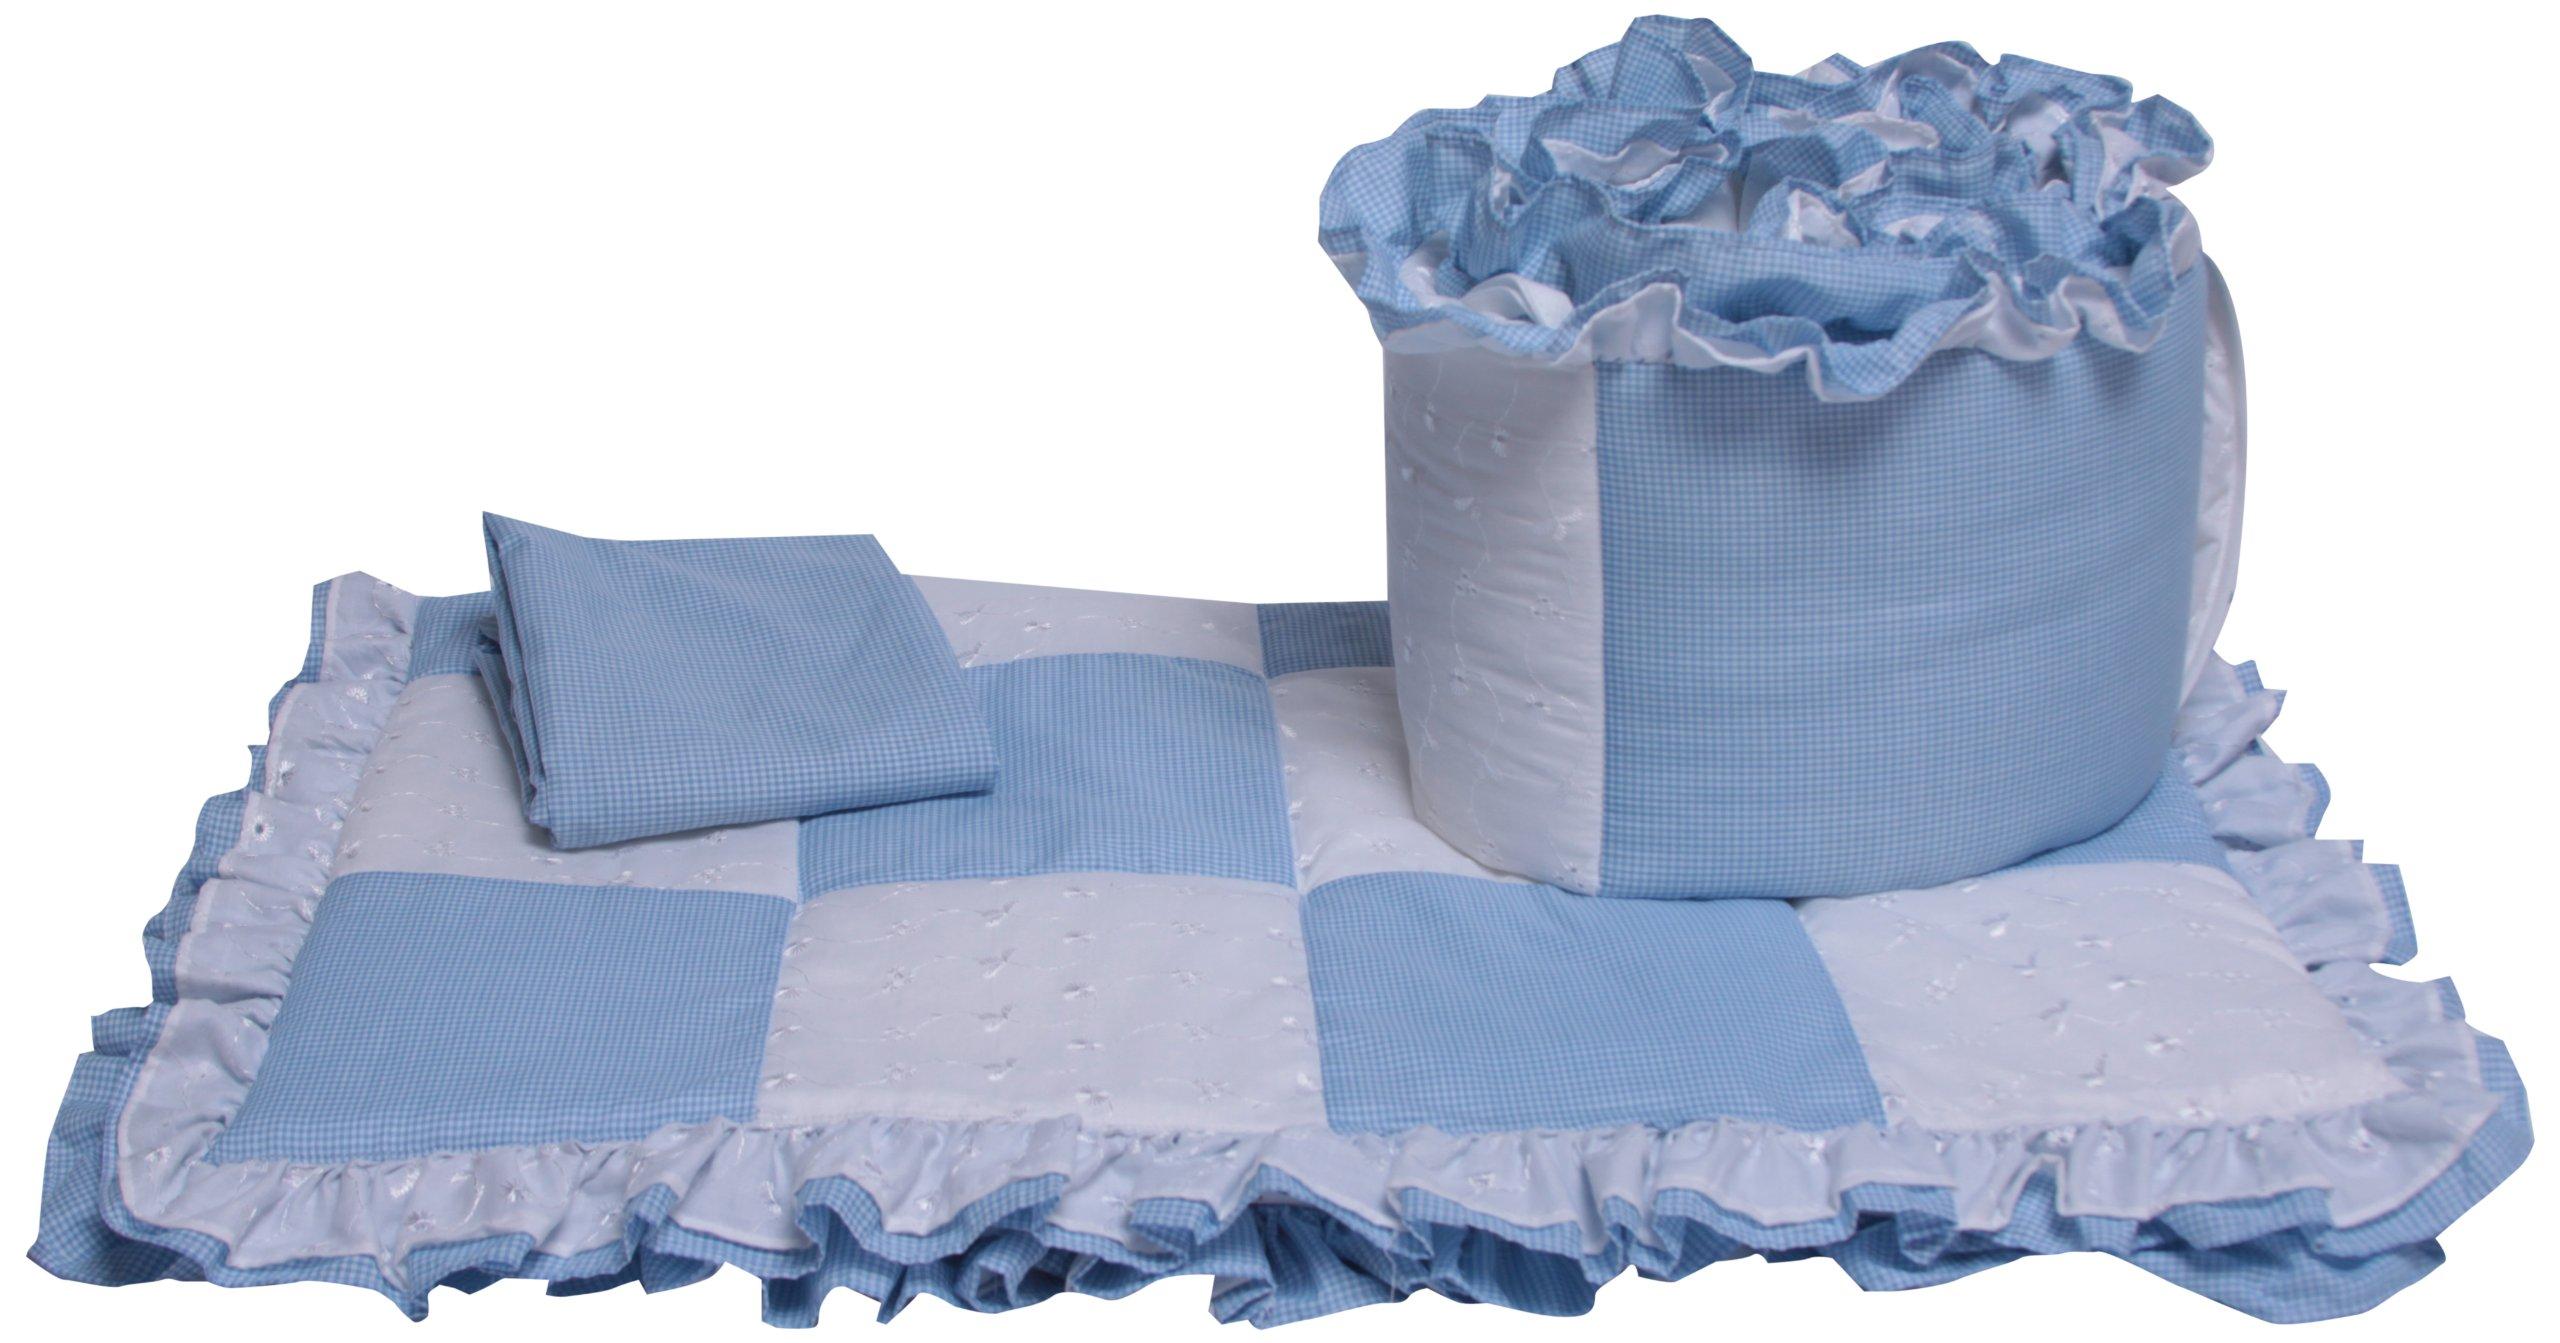 Baby Doll Bedding Gingham Cradle Bedding Set, Blue by BabyDoll Bedding